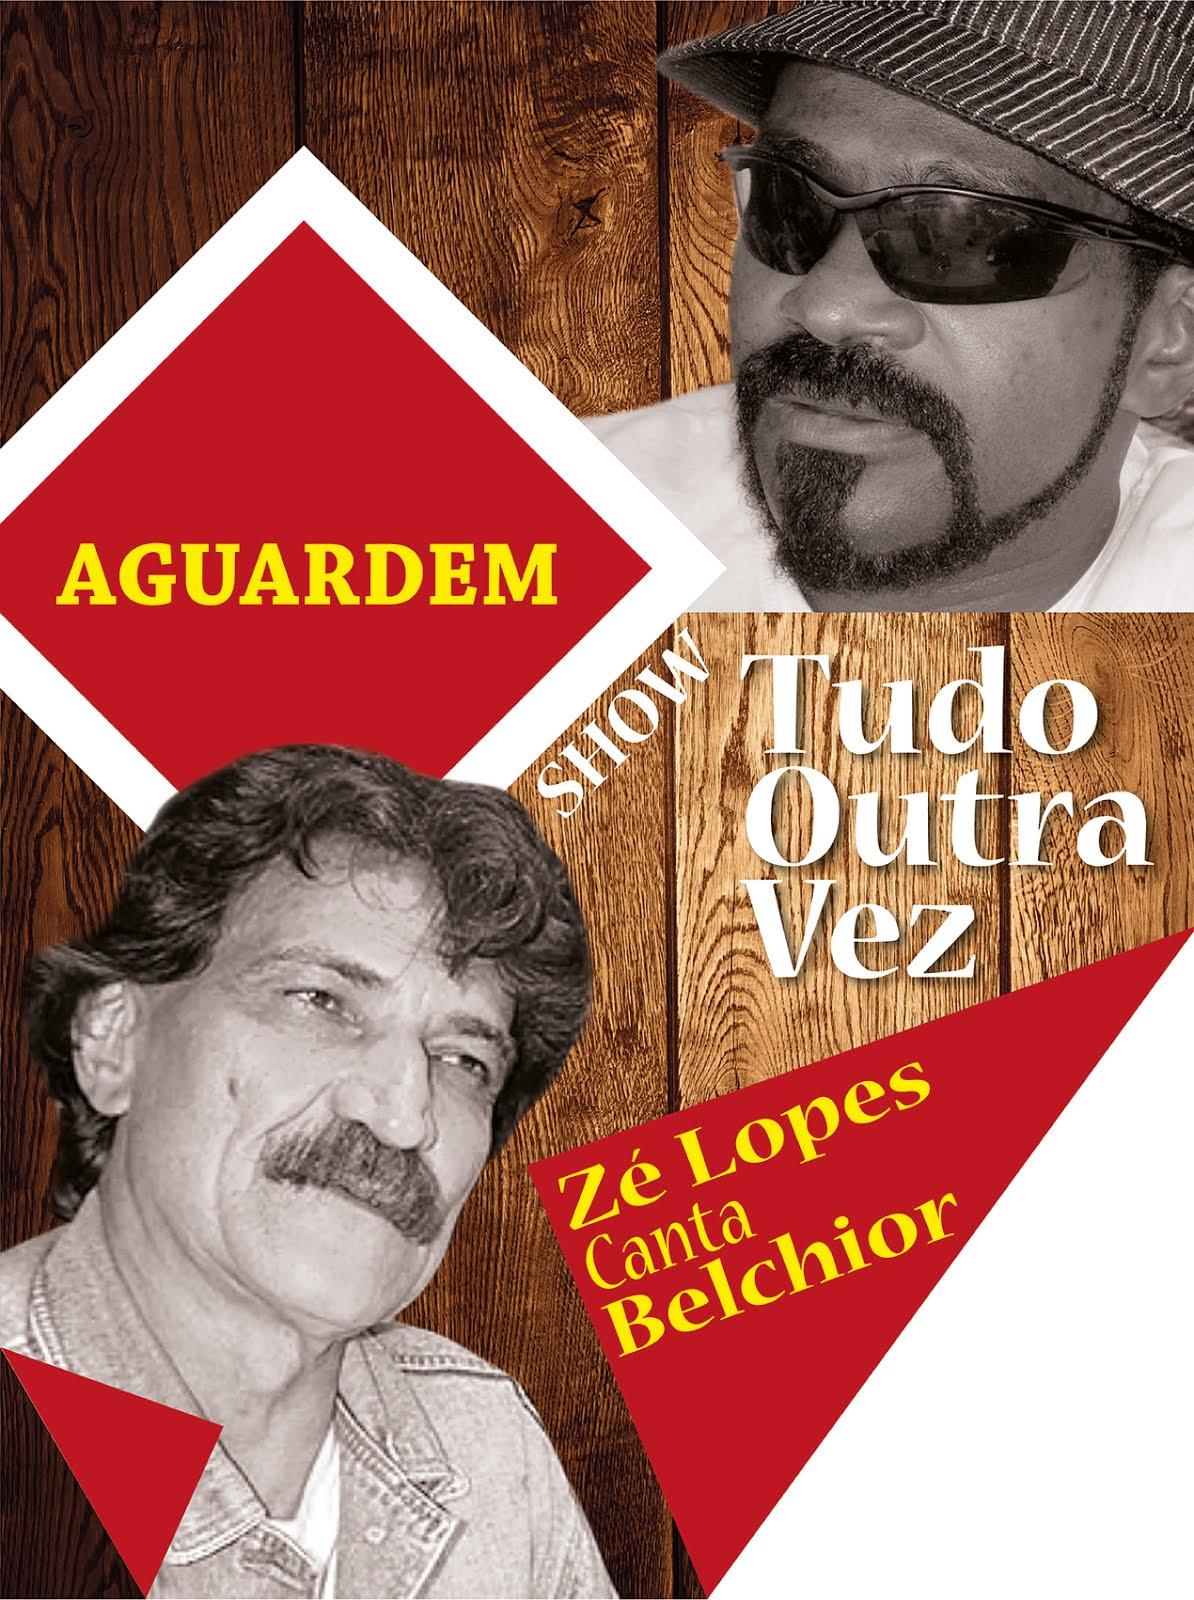 Zé Lopes canta Belchior